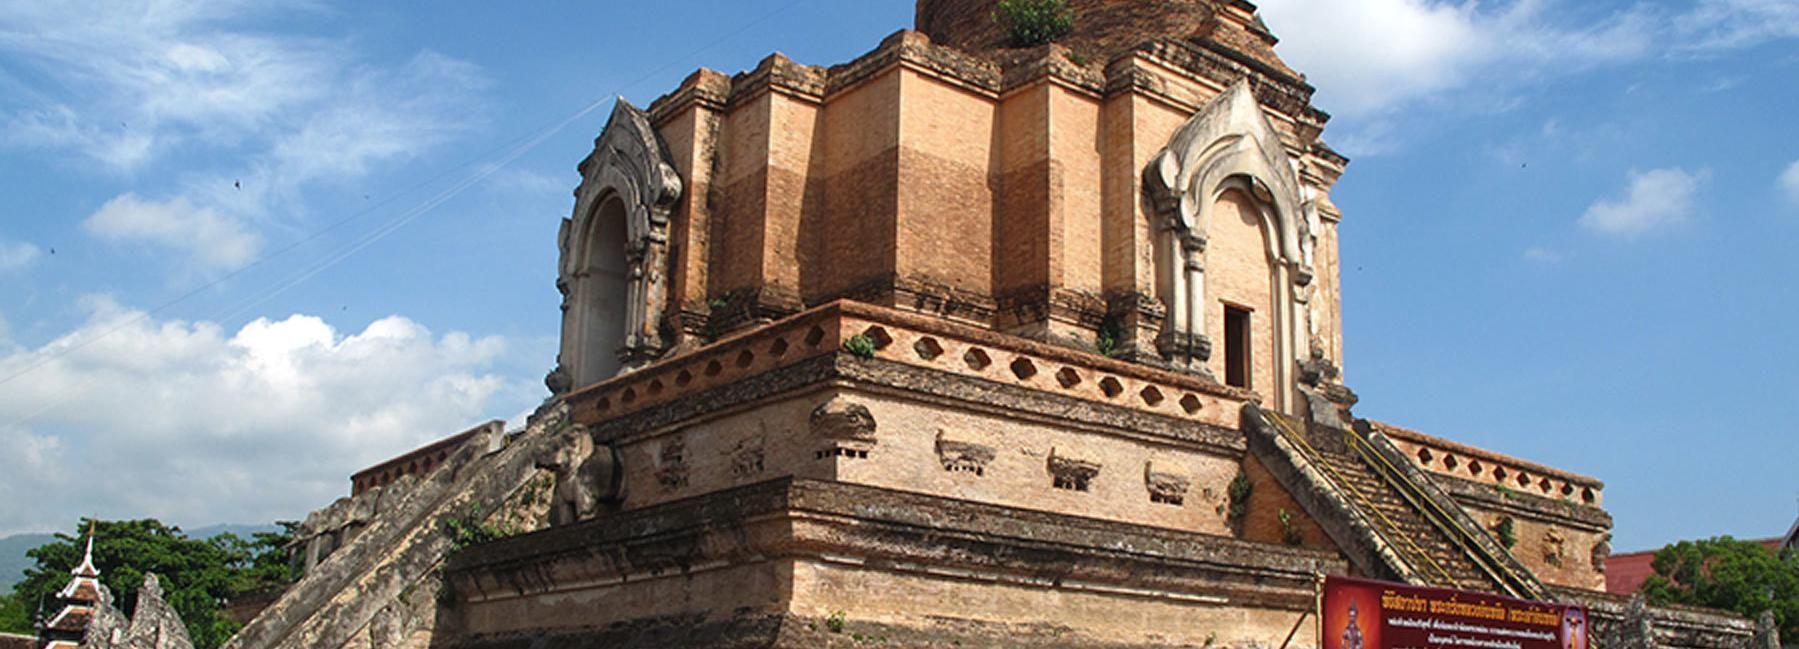 Chiang Mai: Temples & Culture Tour